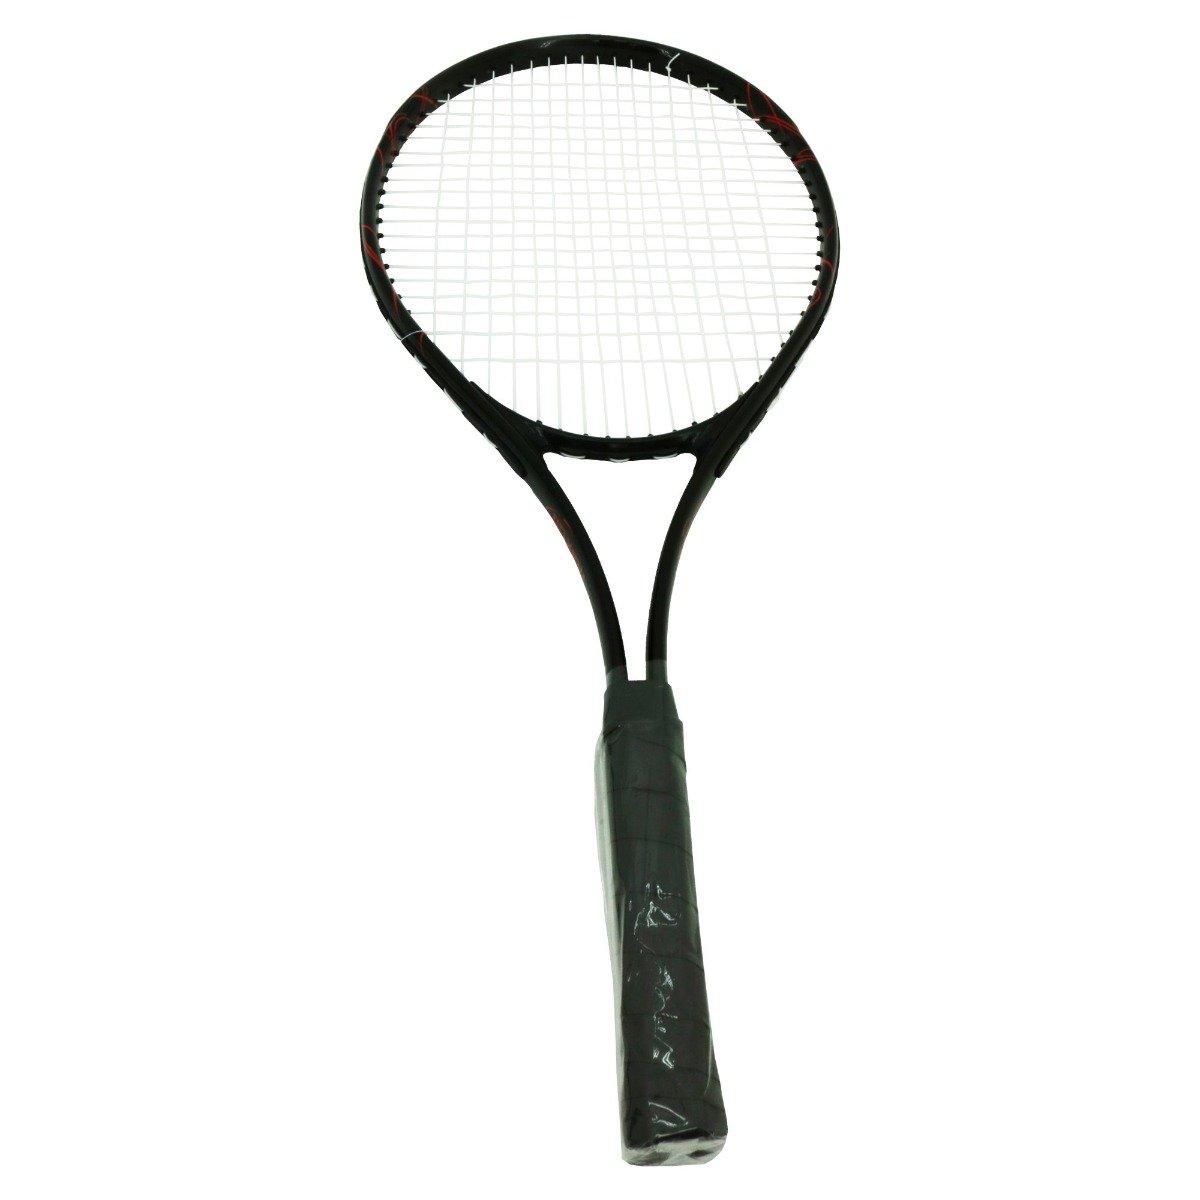 Racheta de tenis pentru adulti Maxtar